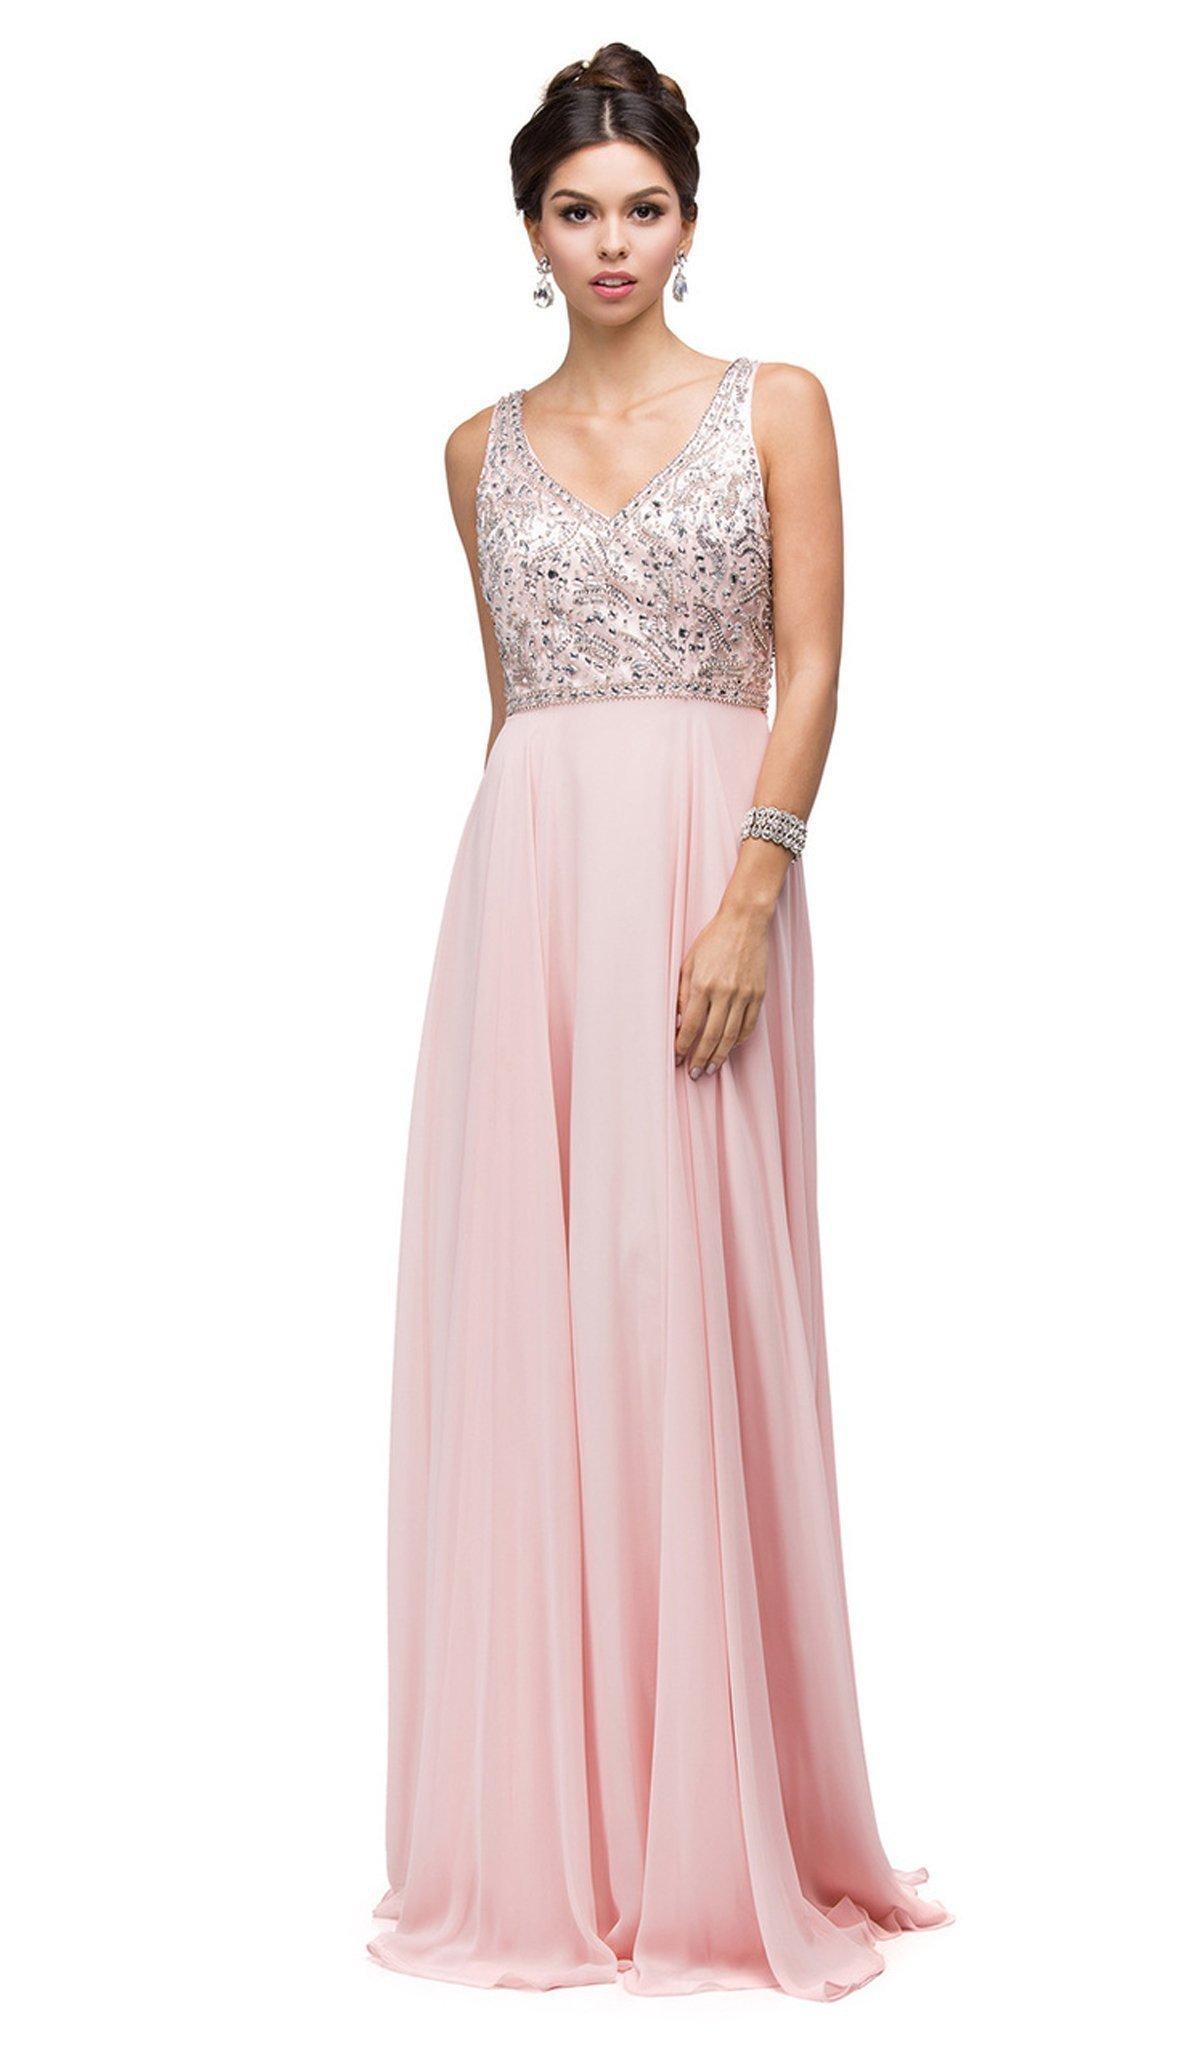 Dancing Queen - 9589 Beaded Bodice Chiffon A-line Prom Dress